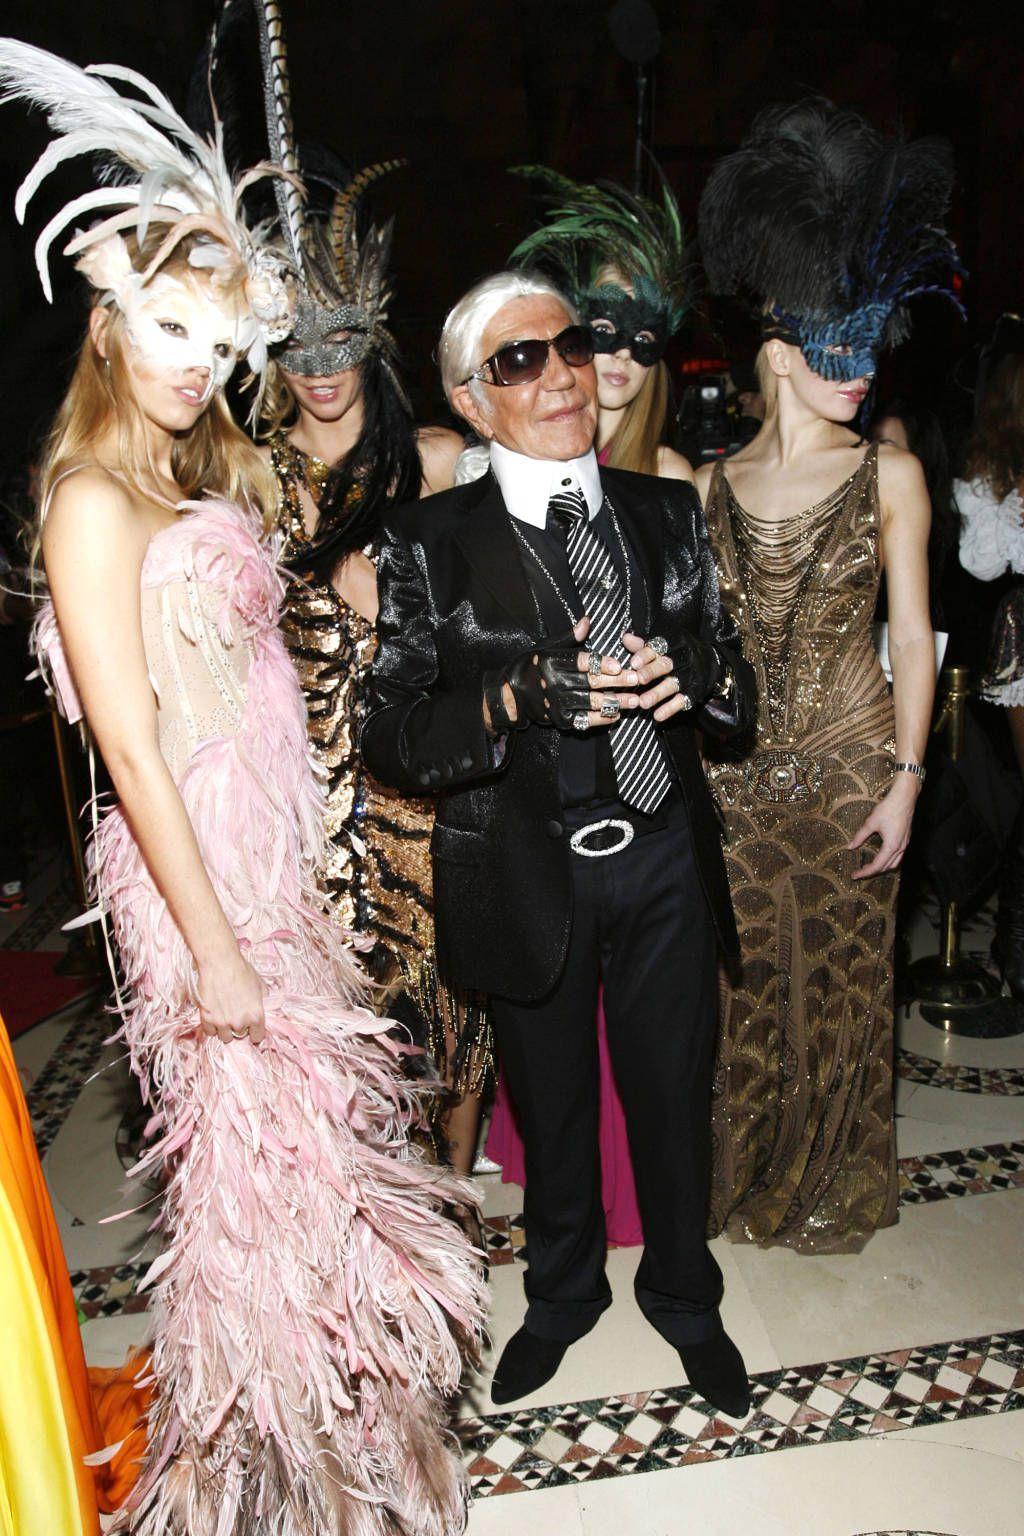 33 Celebrity Halloween Costumes - Best Celebrity Costume Ideas - Harperu0027s BAZAAR  sc 1 st  Pinterest & 60 Epic Celebrity Halloween Costume Ideas | Celebrity halloween ...